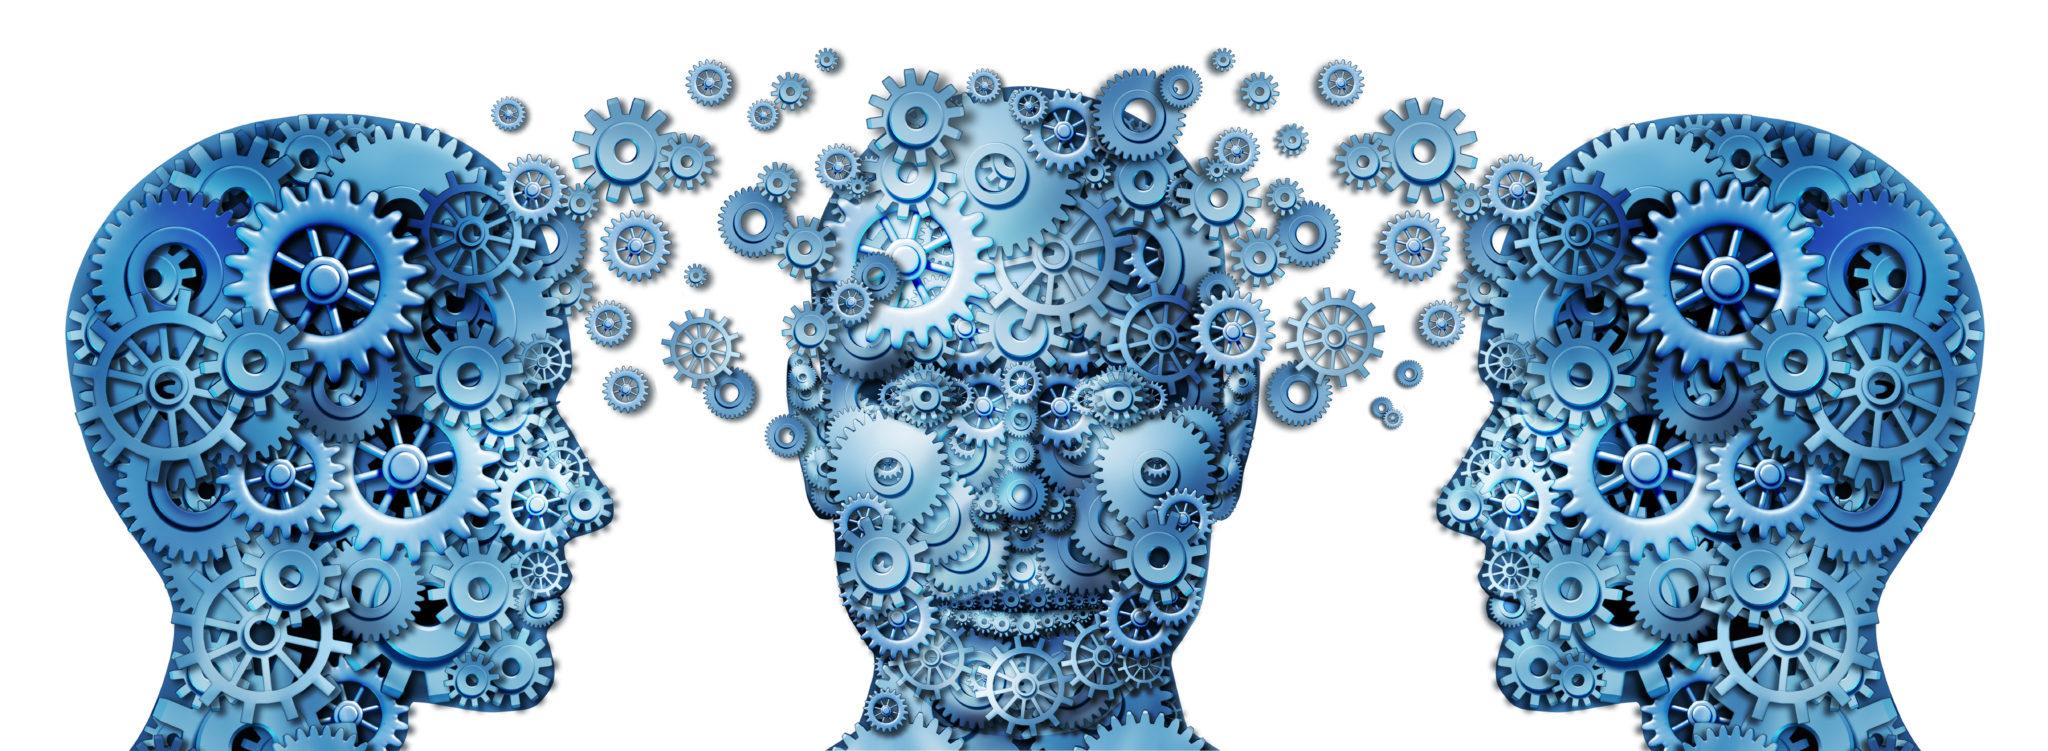 Deconstructing Psychology